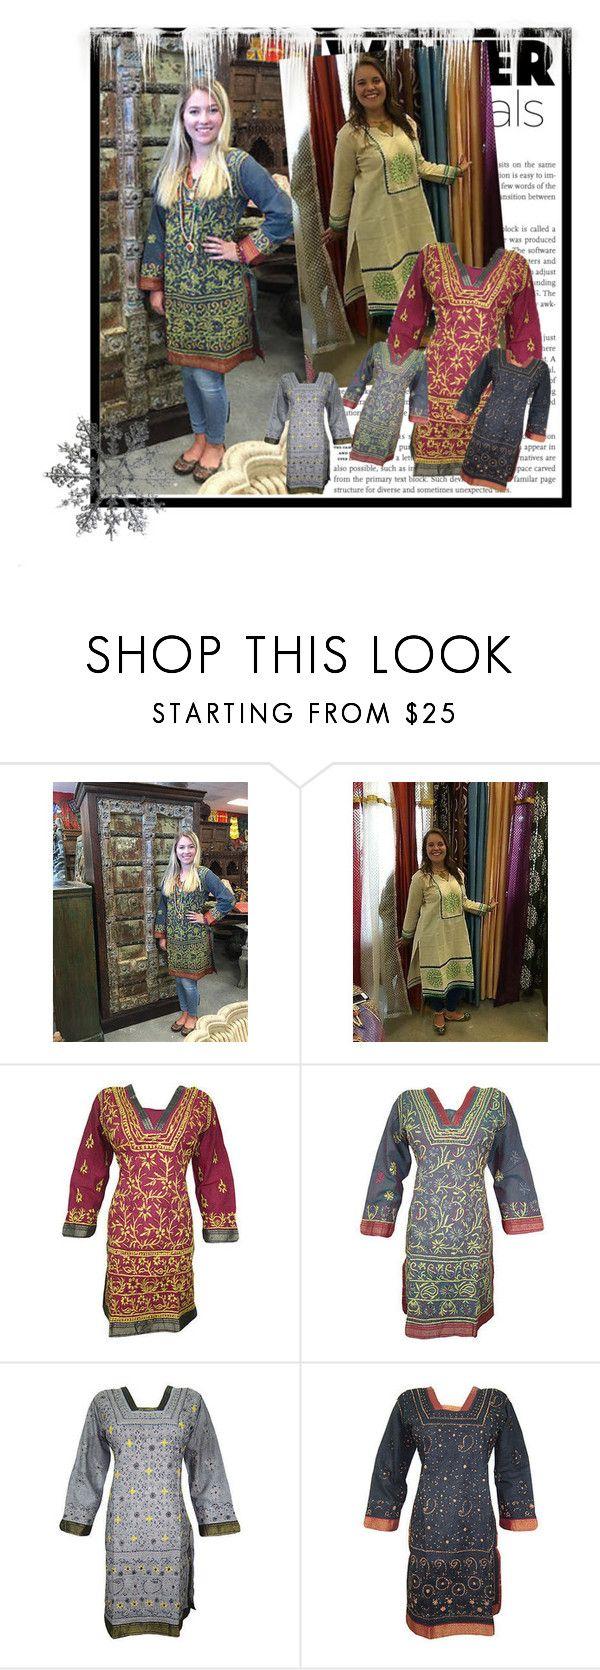 Ethnic Embroidered Long Tunic Dress by baydeals on Polyvore featuring dress, summerstyle, tunic, kurti and cottonkurti   http://stores.ebay.com/mogulgallery/DESIGNER-KURTI-/_i.html?_fsub=665889019&_sid=3781319&_trksid=p4634.c0.m322